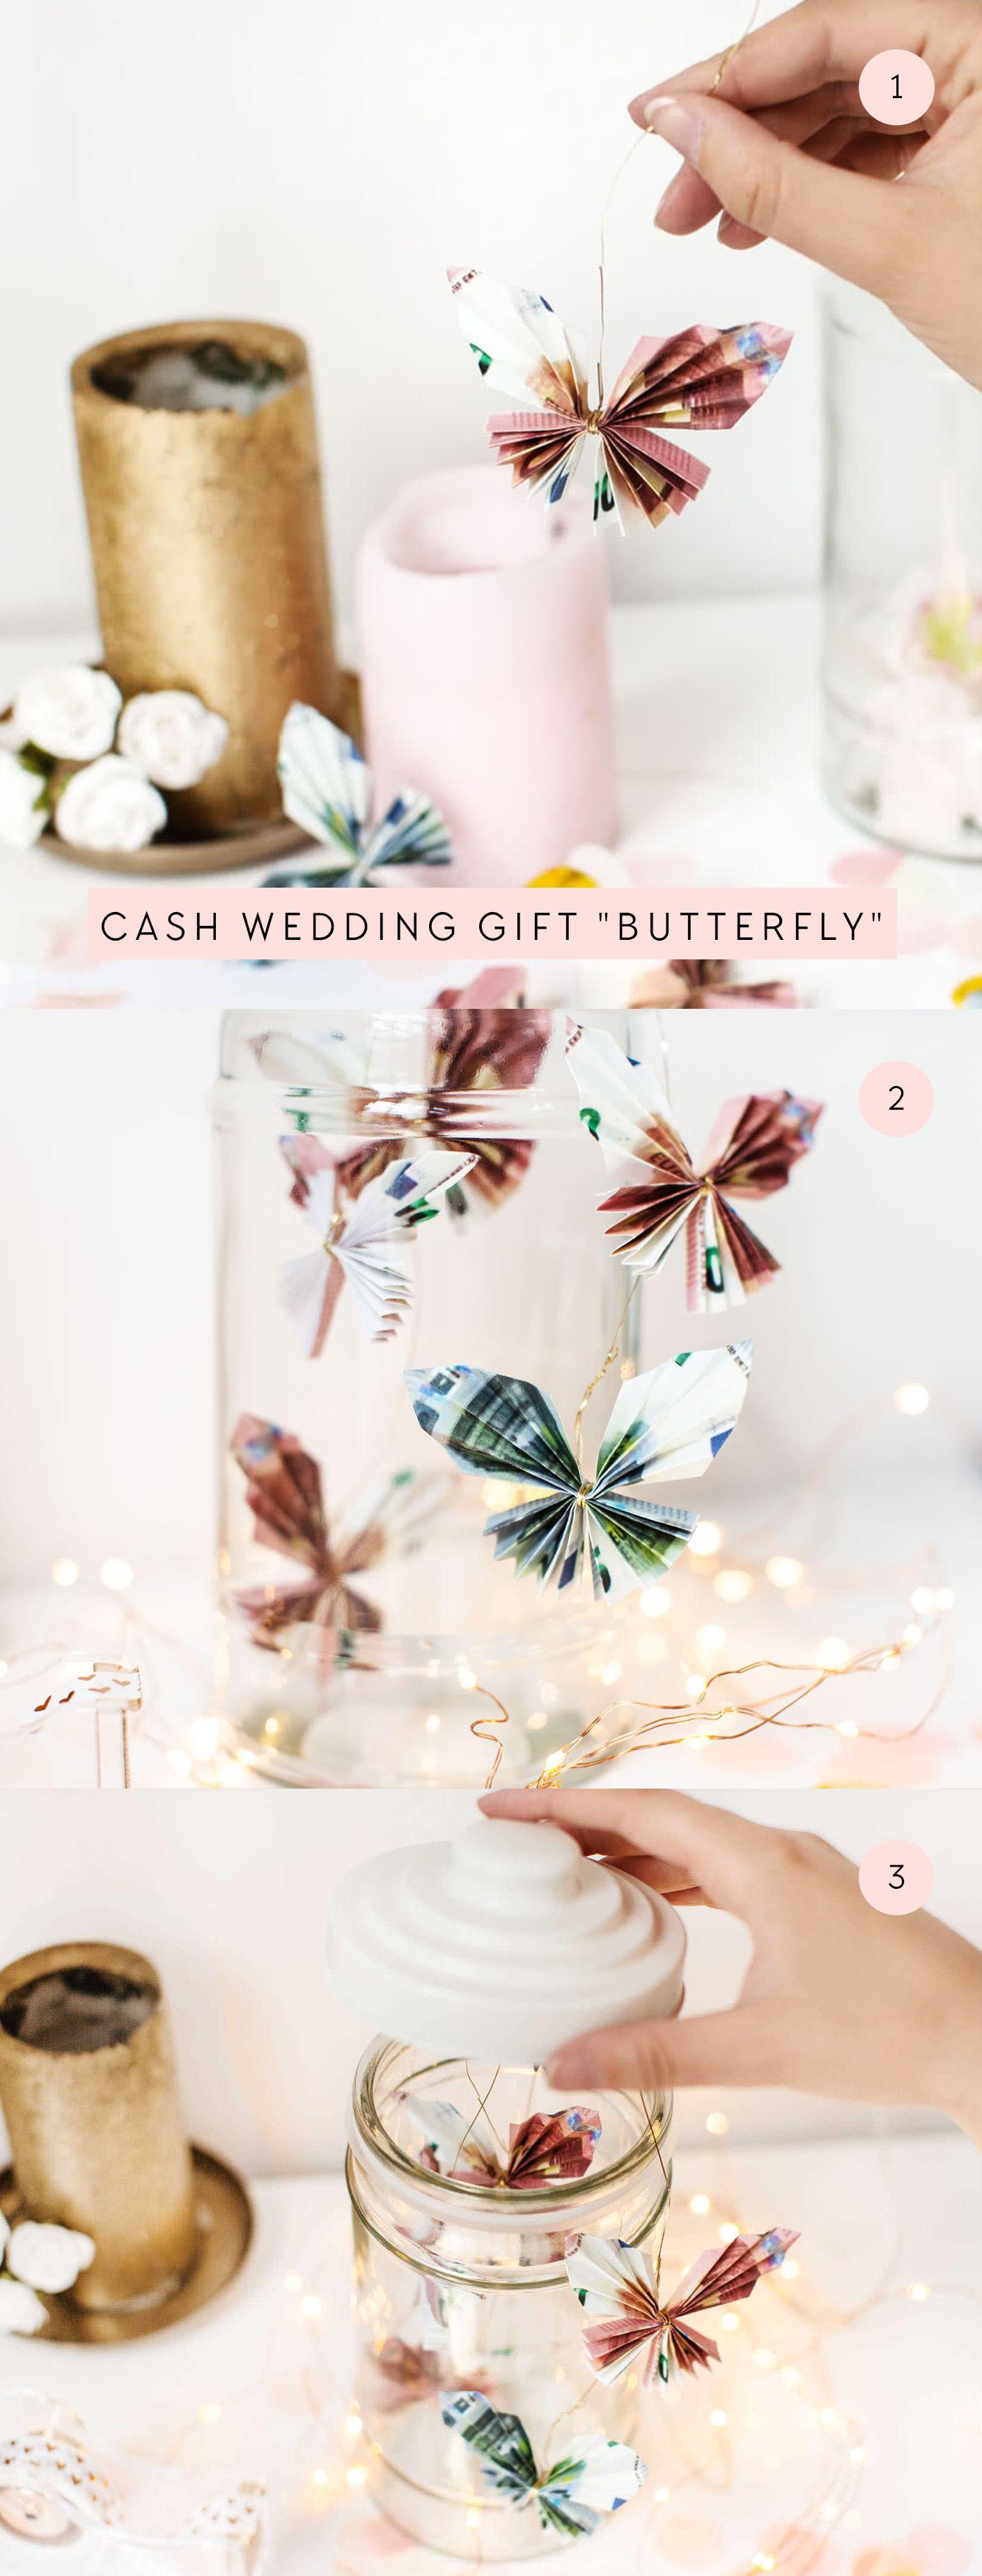 Cash Wedding Gift | Money gift wedding DIY  – JO & JUDY | DIYS & CRAFTS